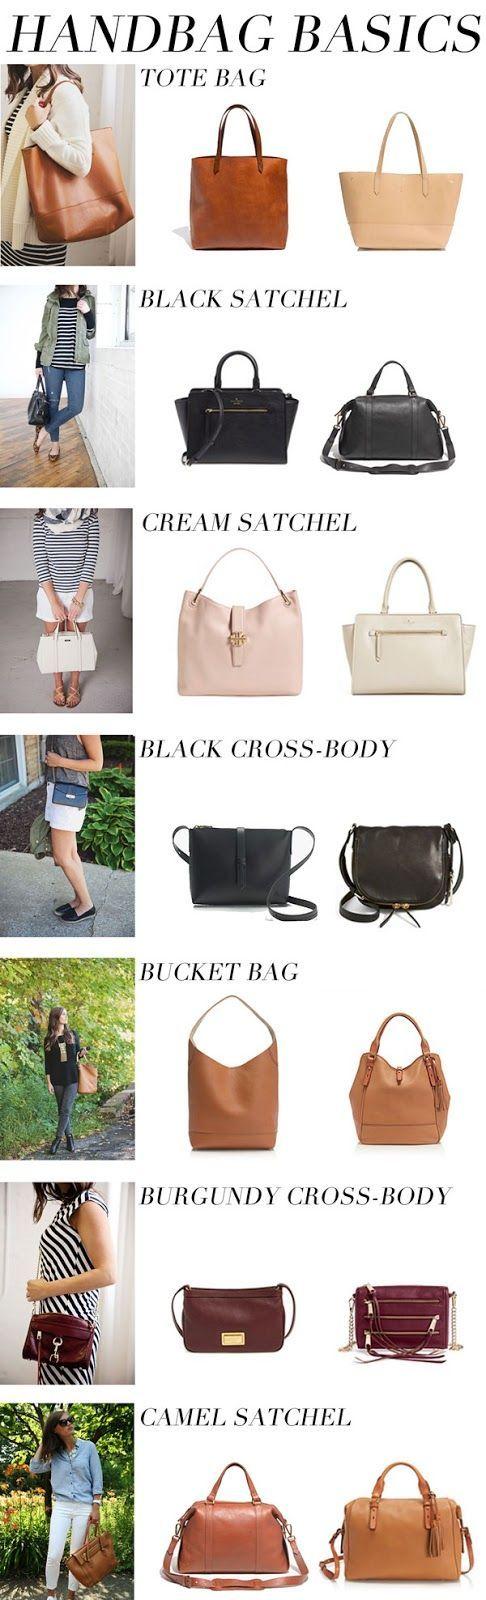 http://www.styleyourwear.com/category/handbags-for-women/ Handbag basics...